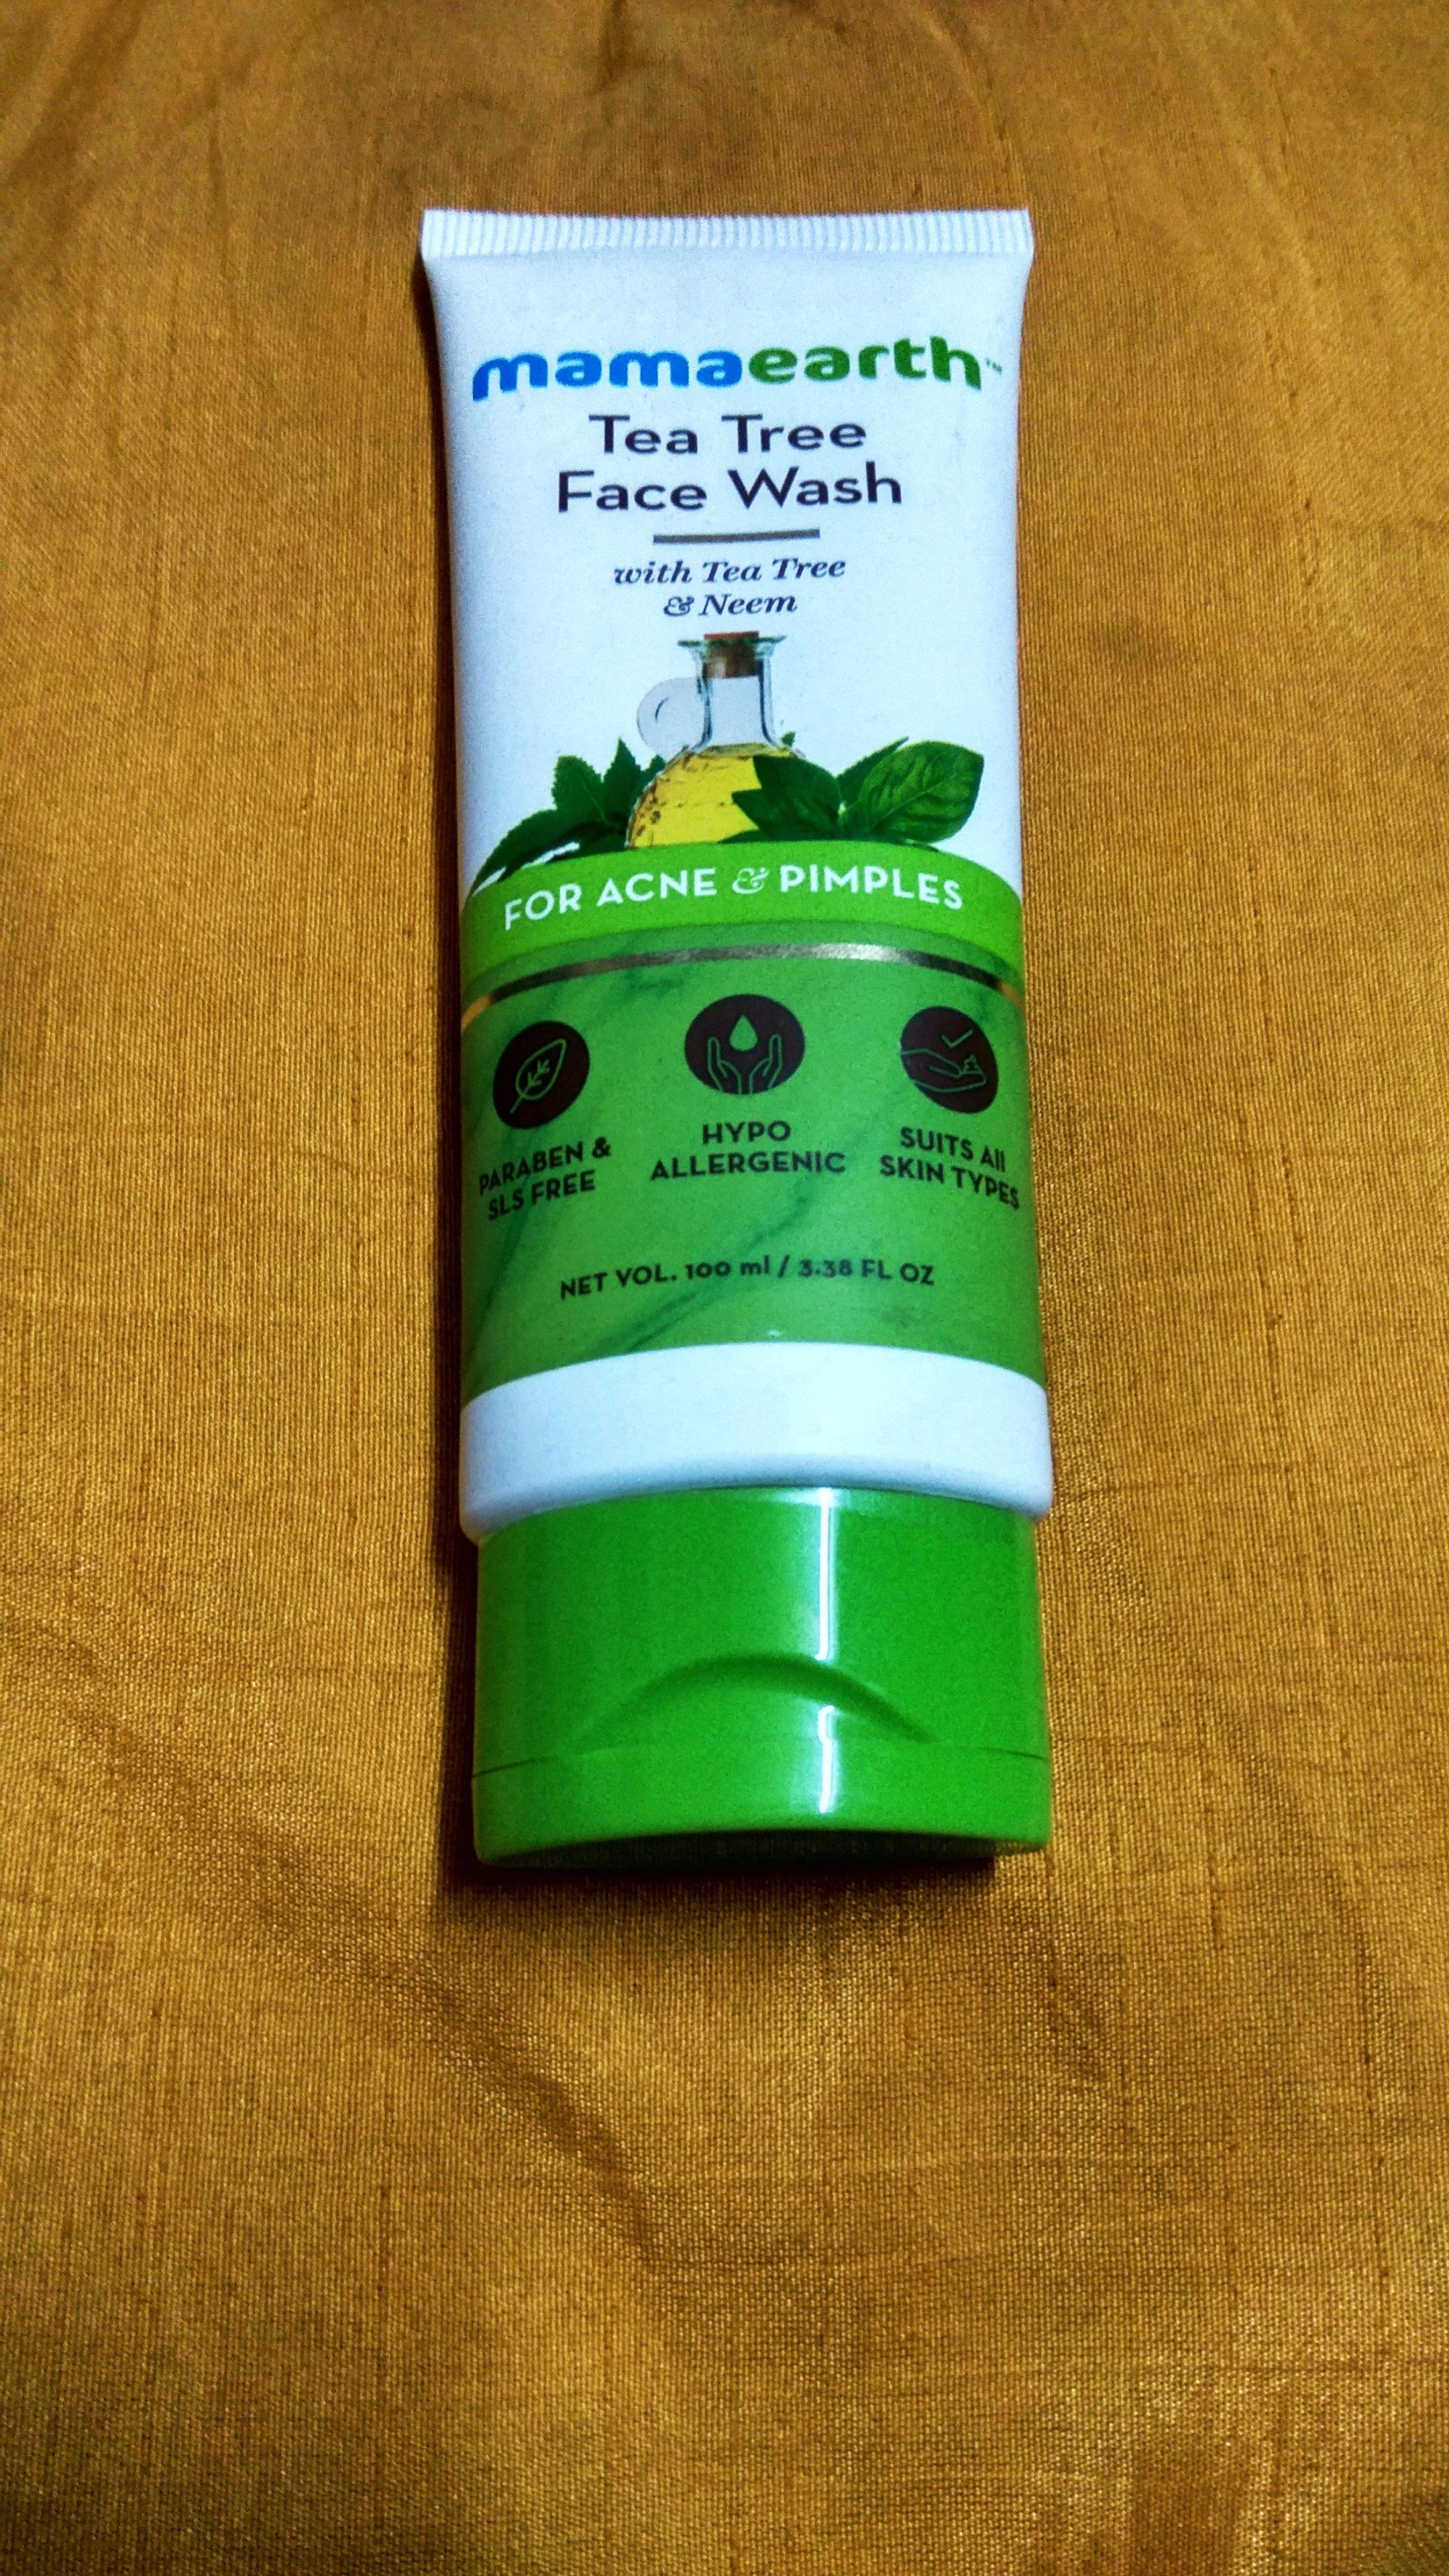 Mamaearth Tea Tree Natural Face Wash For Acne & Pimples -Mamaearth Tea Tree Face Wash-By thestylishvibe